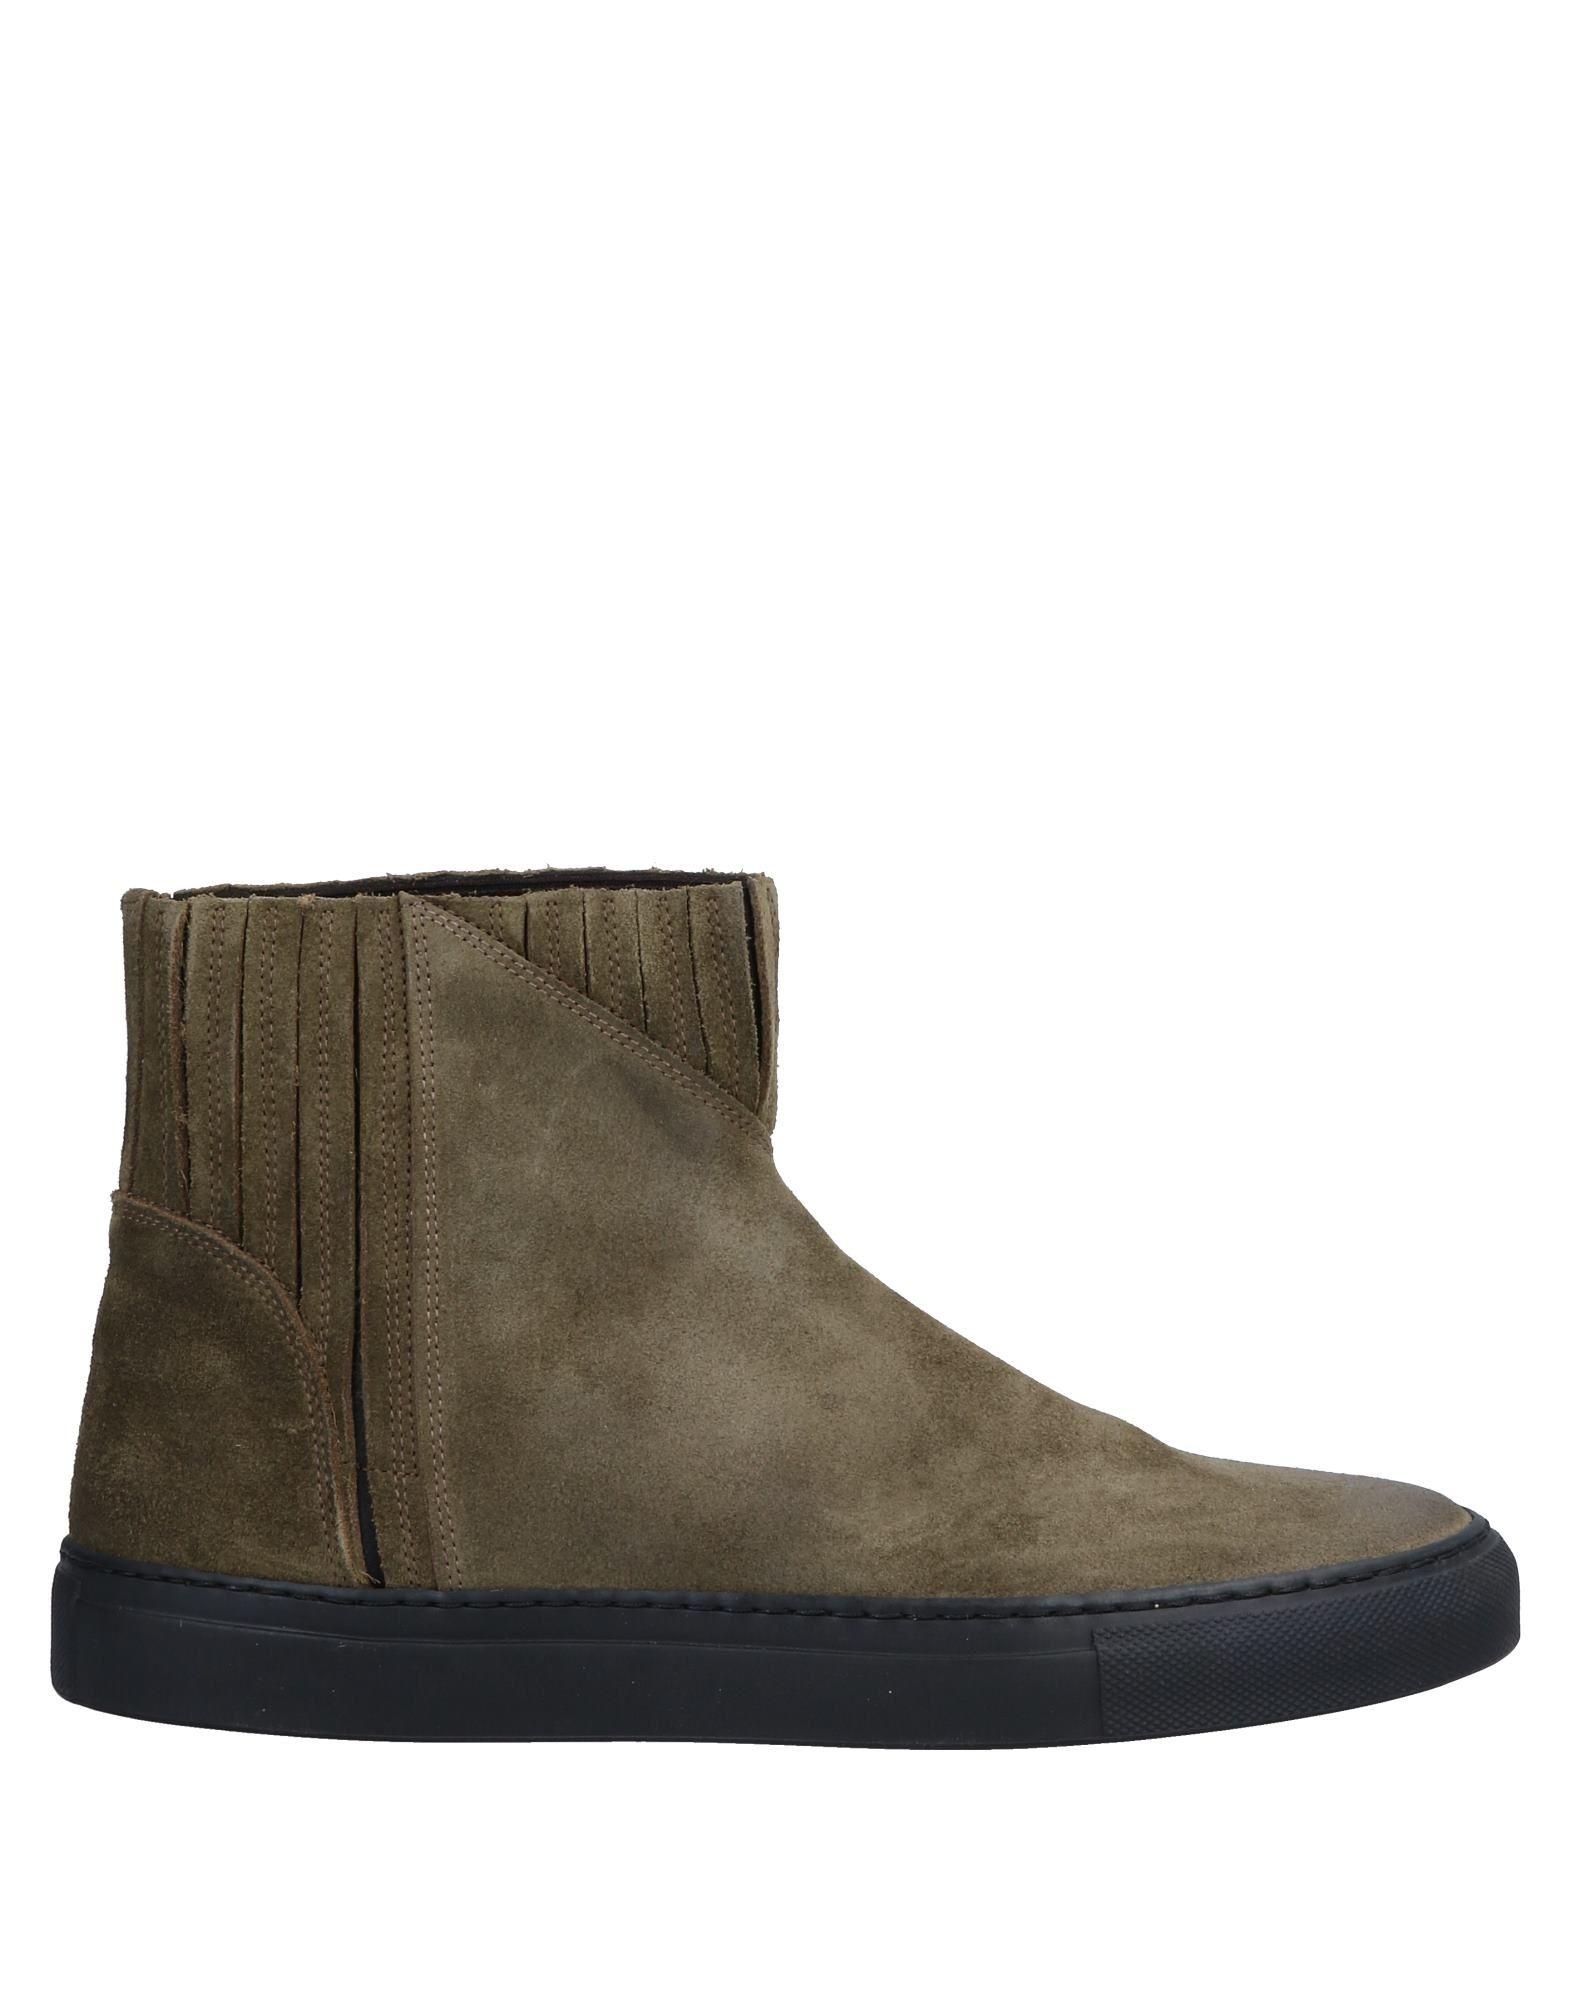 Stilvolle billige Schuhe Buttero® Stiefelette Damen  11553393ID